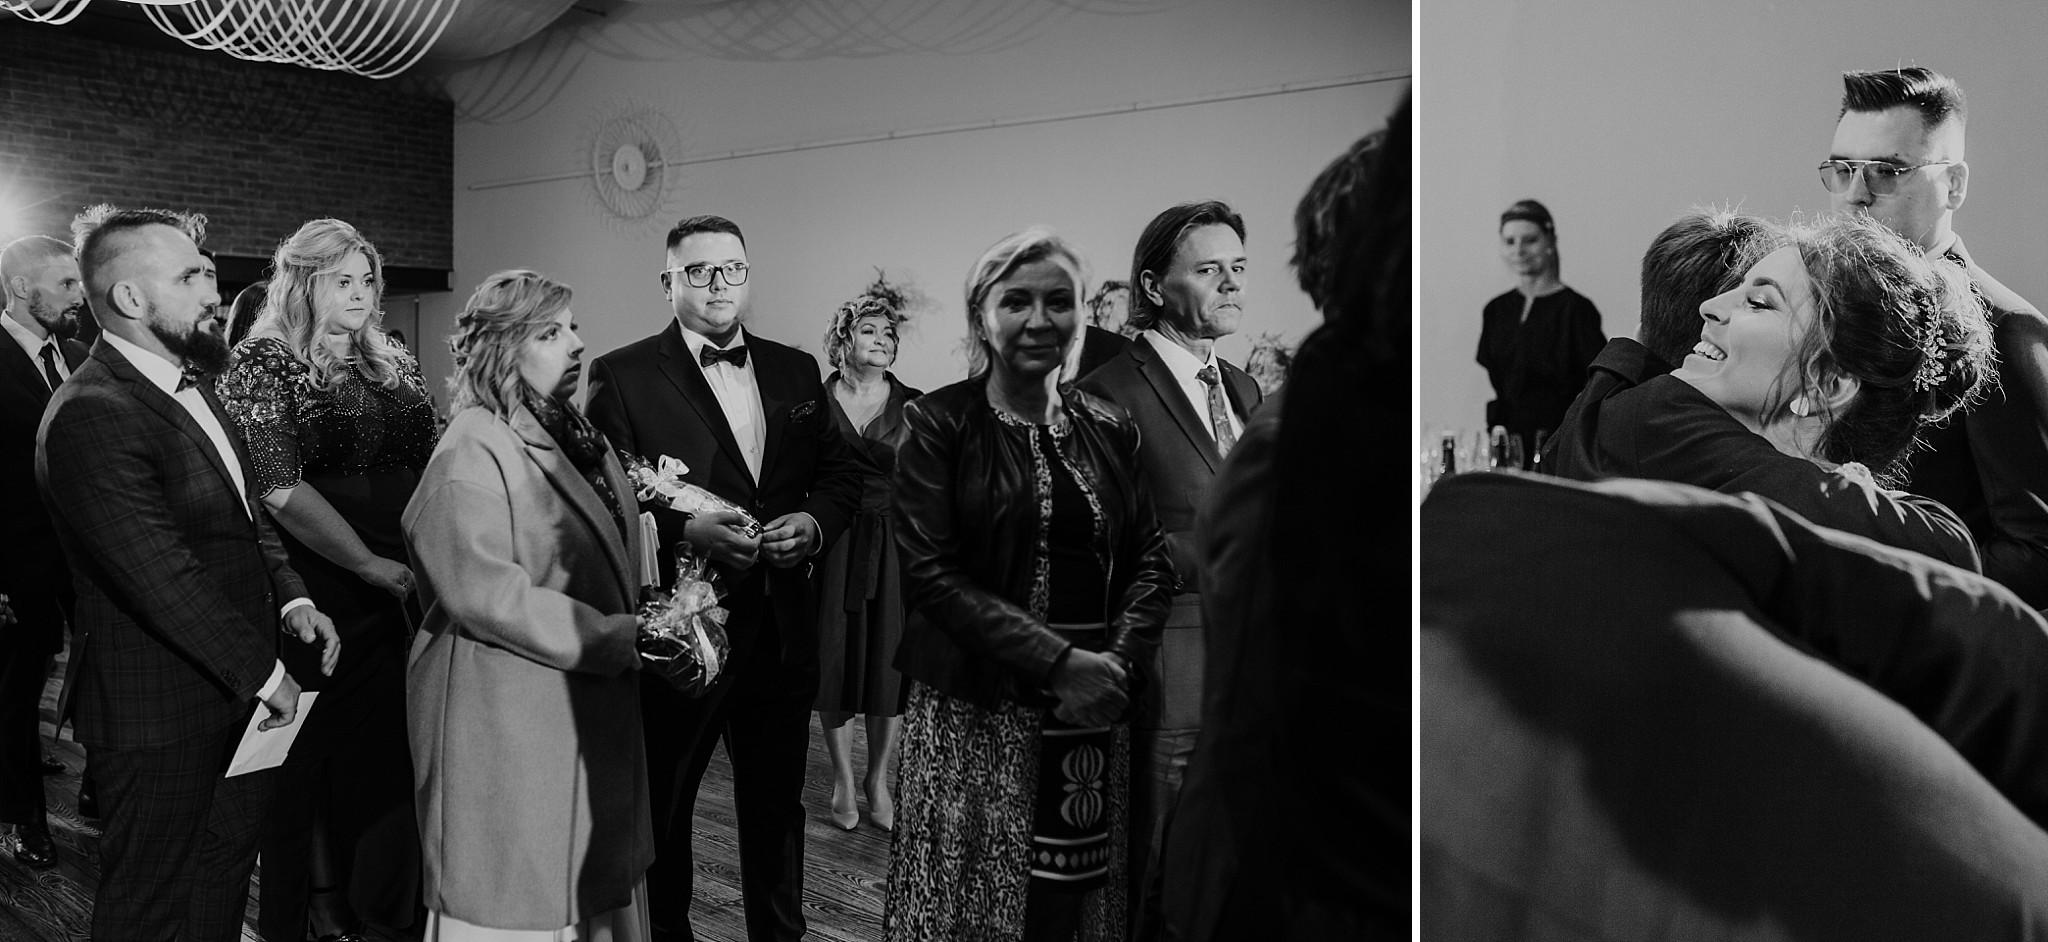 fotograf poznan wesele dobra truskawka piekne wesele pod poznaniem wesele w dobrej truskawce piekna para mloda slub marzen slub koronawirus slub listopad wesele koronawirus 272